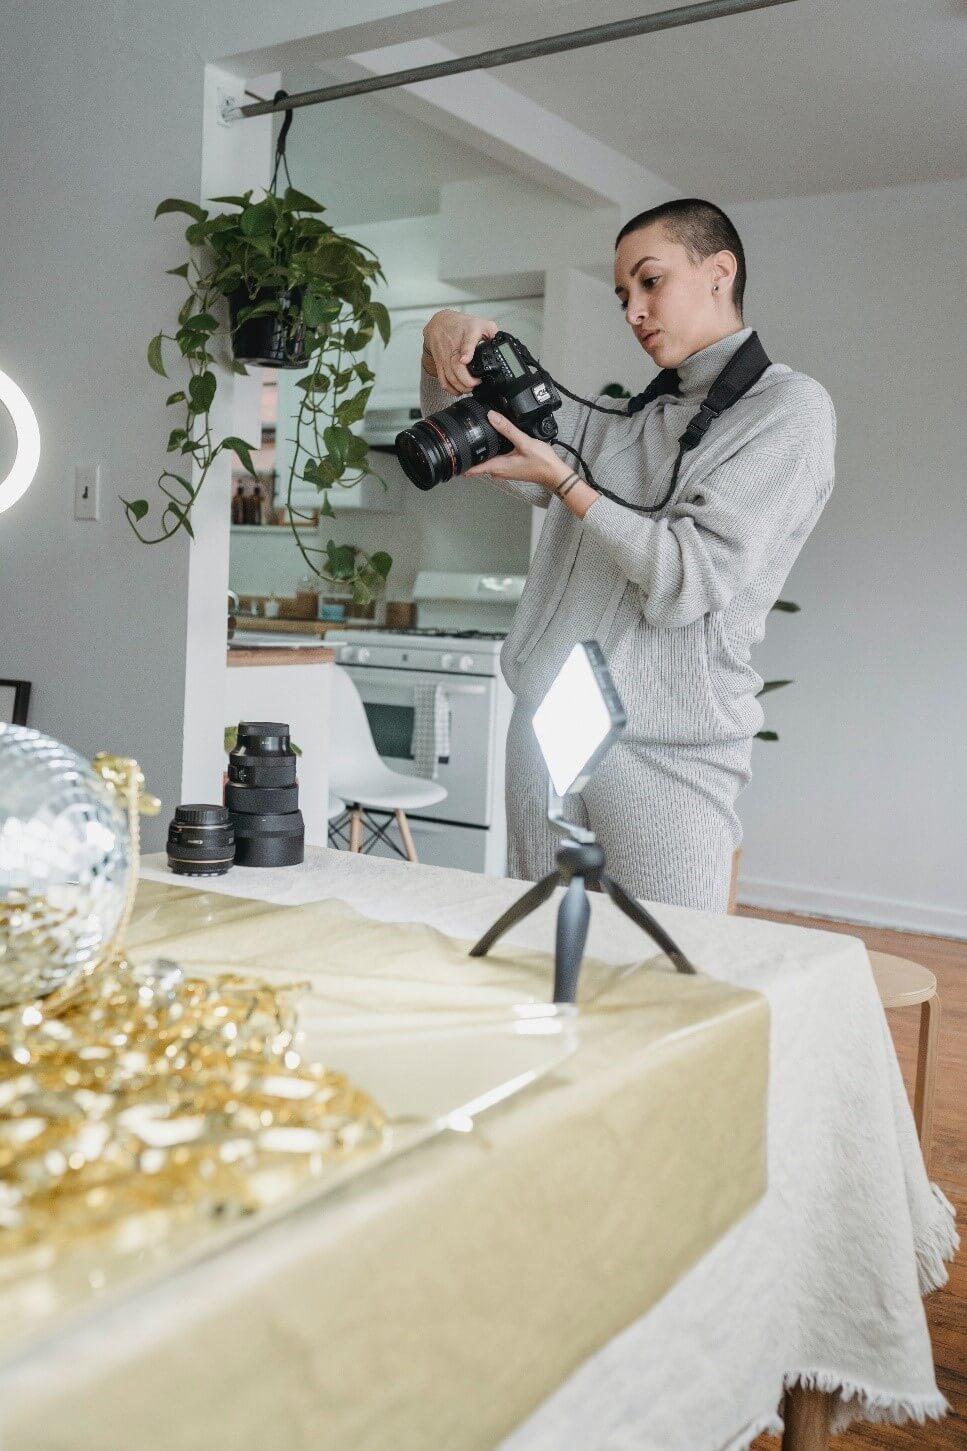 4-shoot-lighting